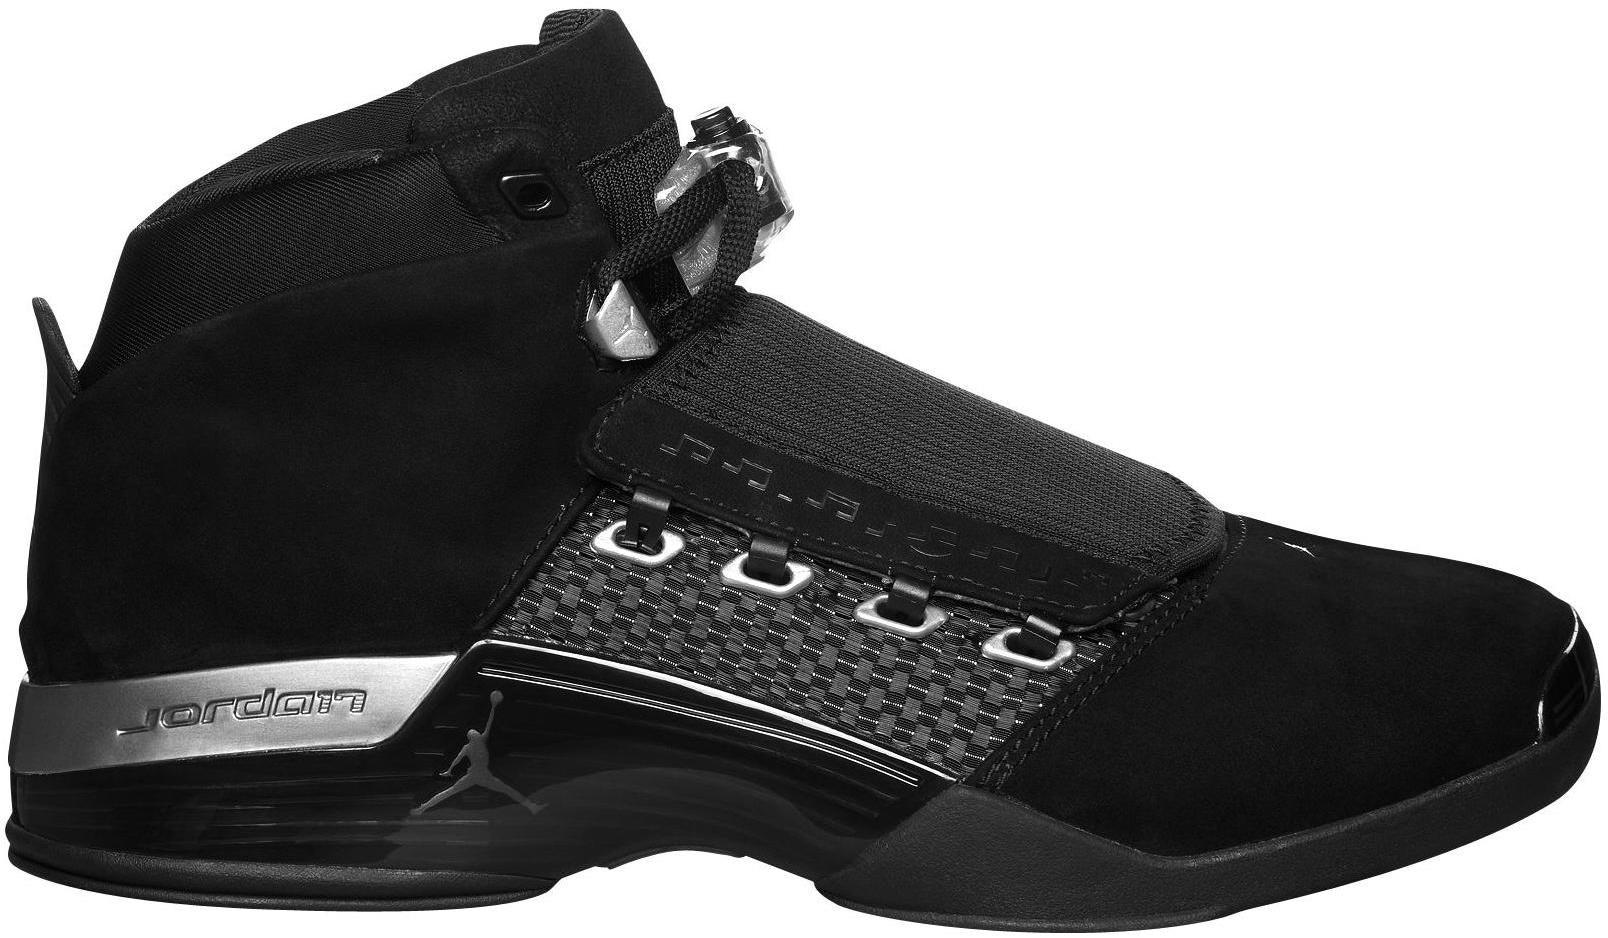 Jordan 17 Retro Black Silver CDP (2008)